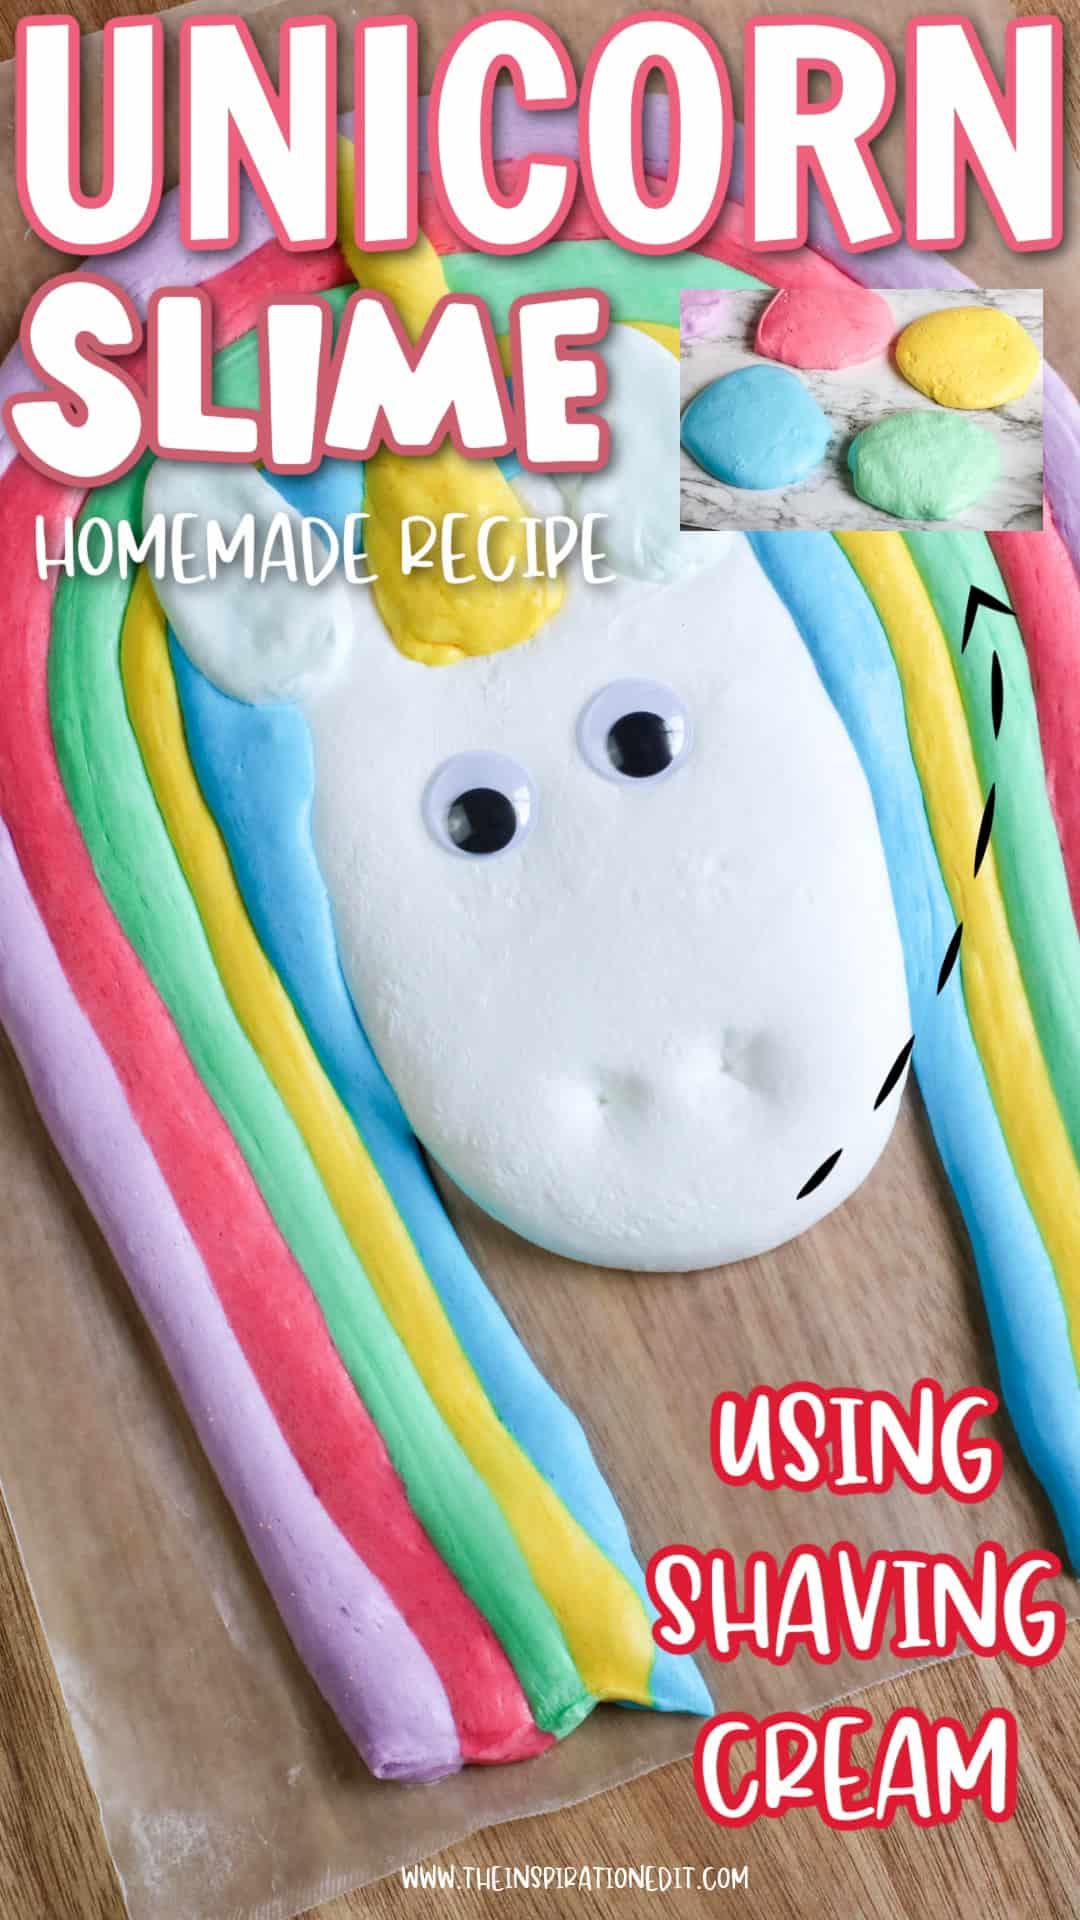 unicorn-slime